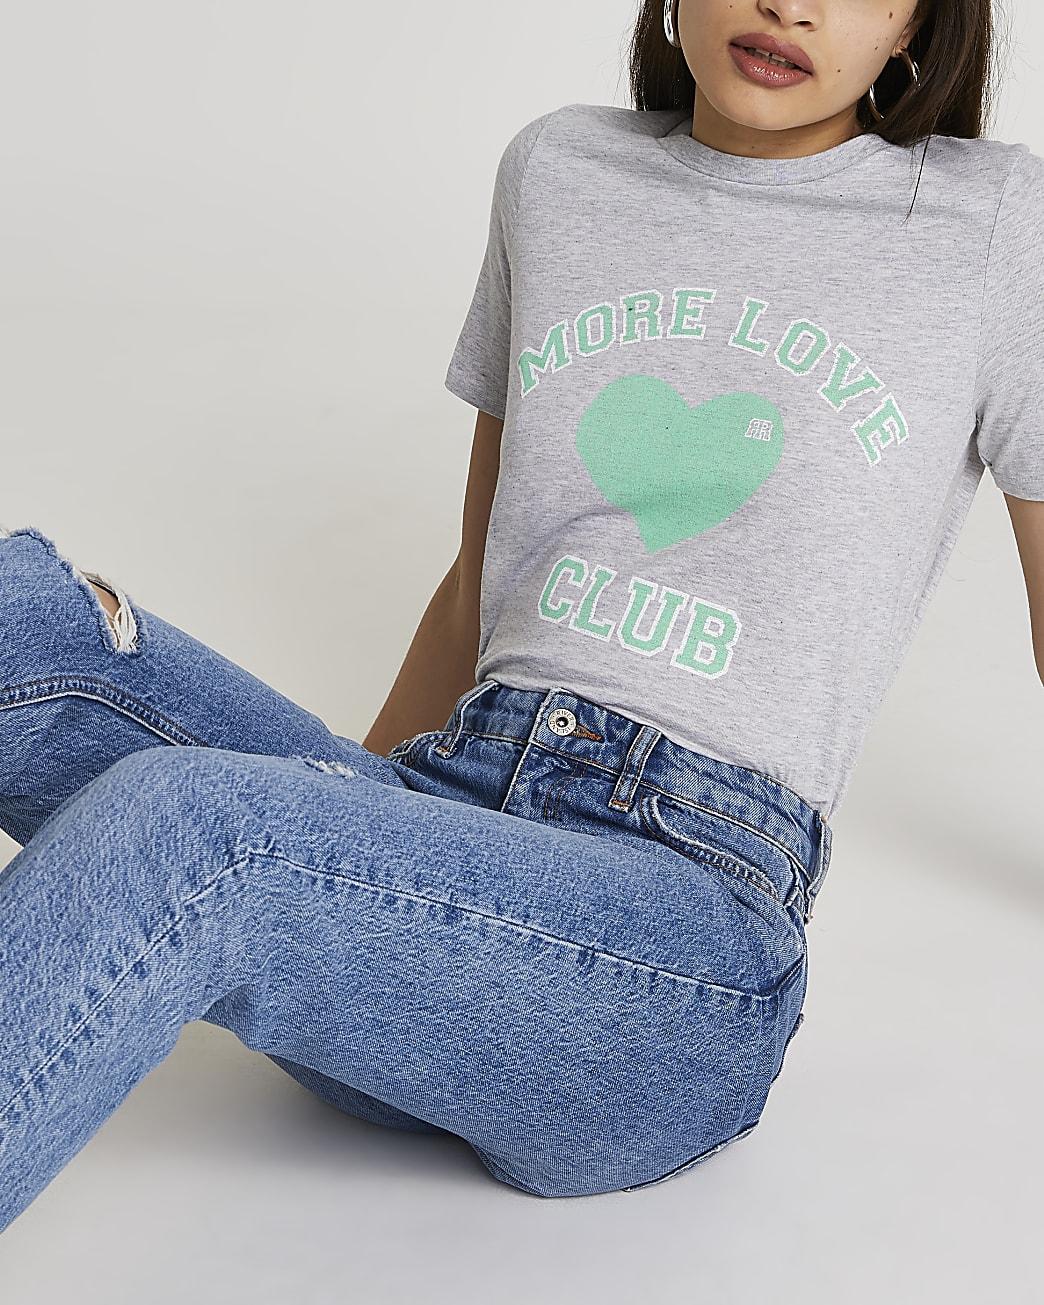 Grey 'More Love Club' heart t-shirt